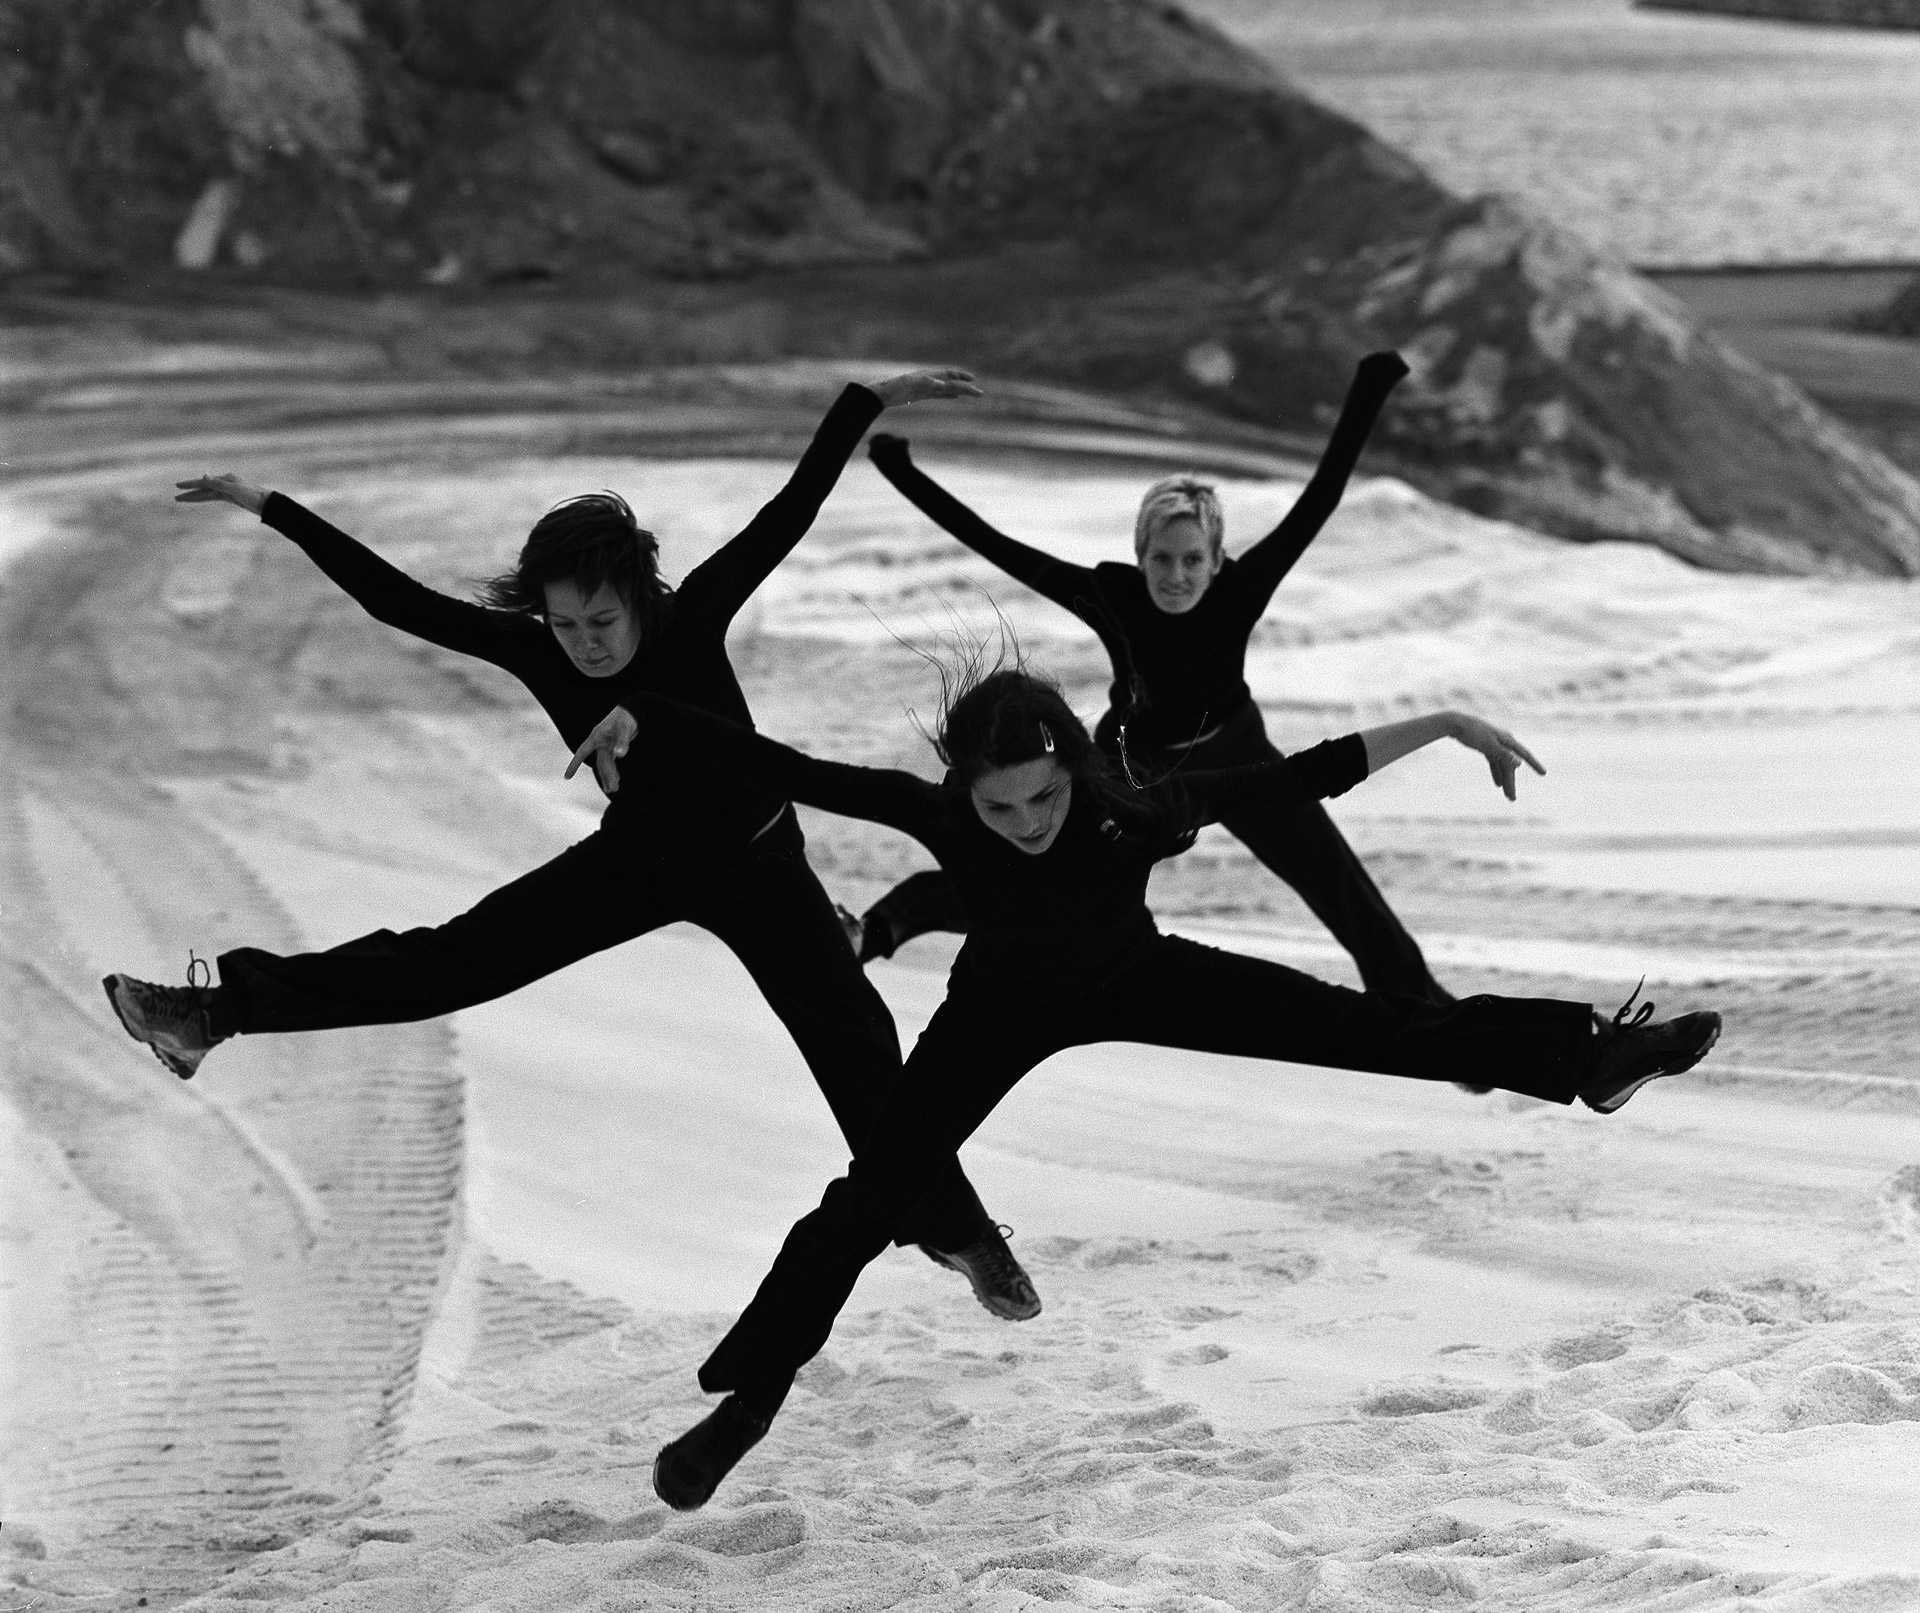 Dance group in air at a salt deposit in Nordhavnen in Copenhagen, Denmark